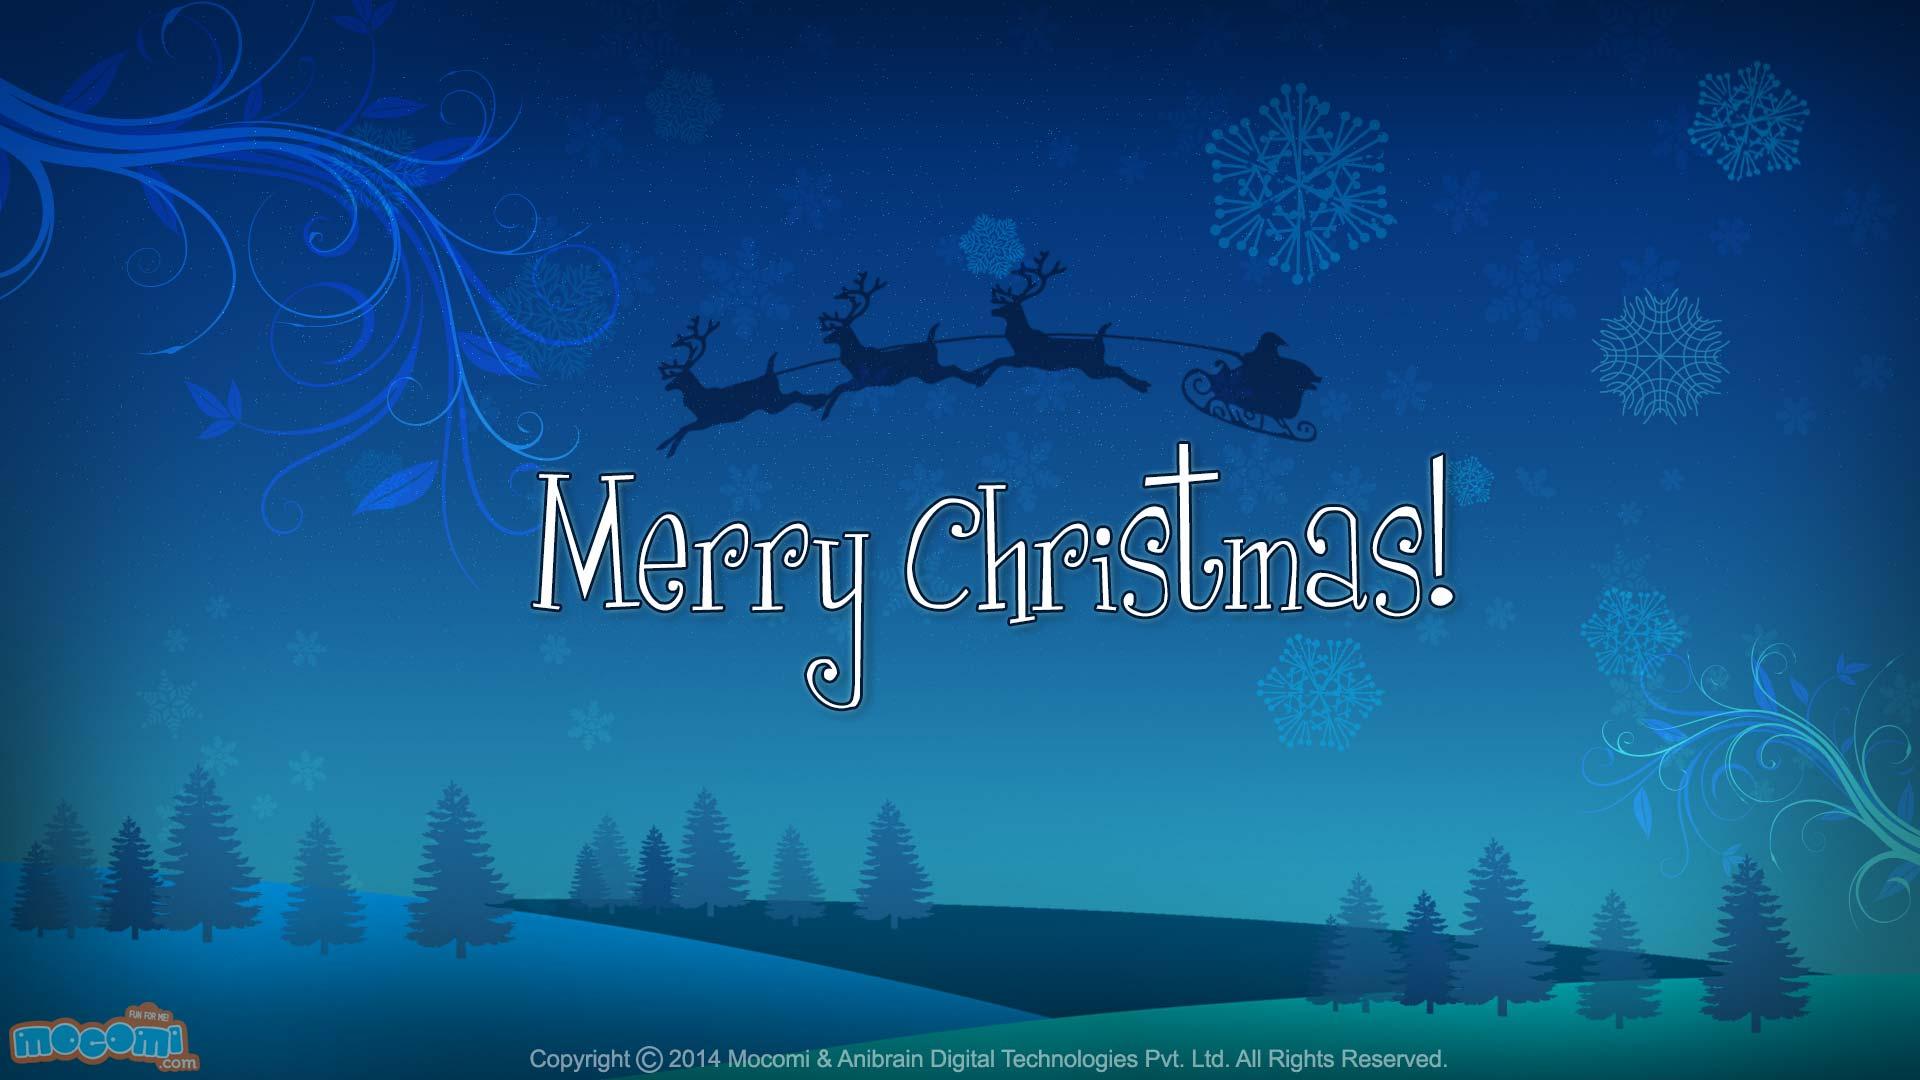 Xmas Tree Hd Wallpaper Merry Christmas Santa S Sleigh Desktop Wallpapers For